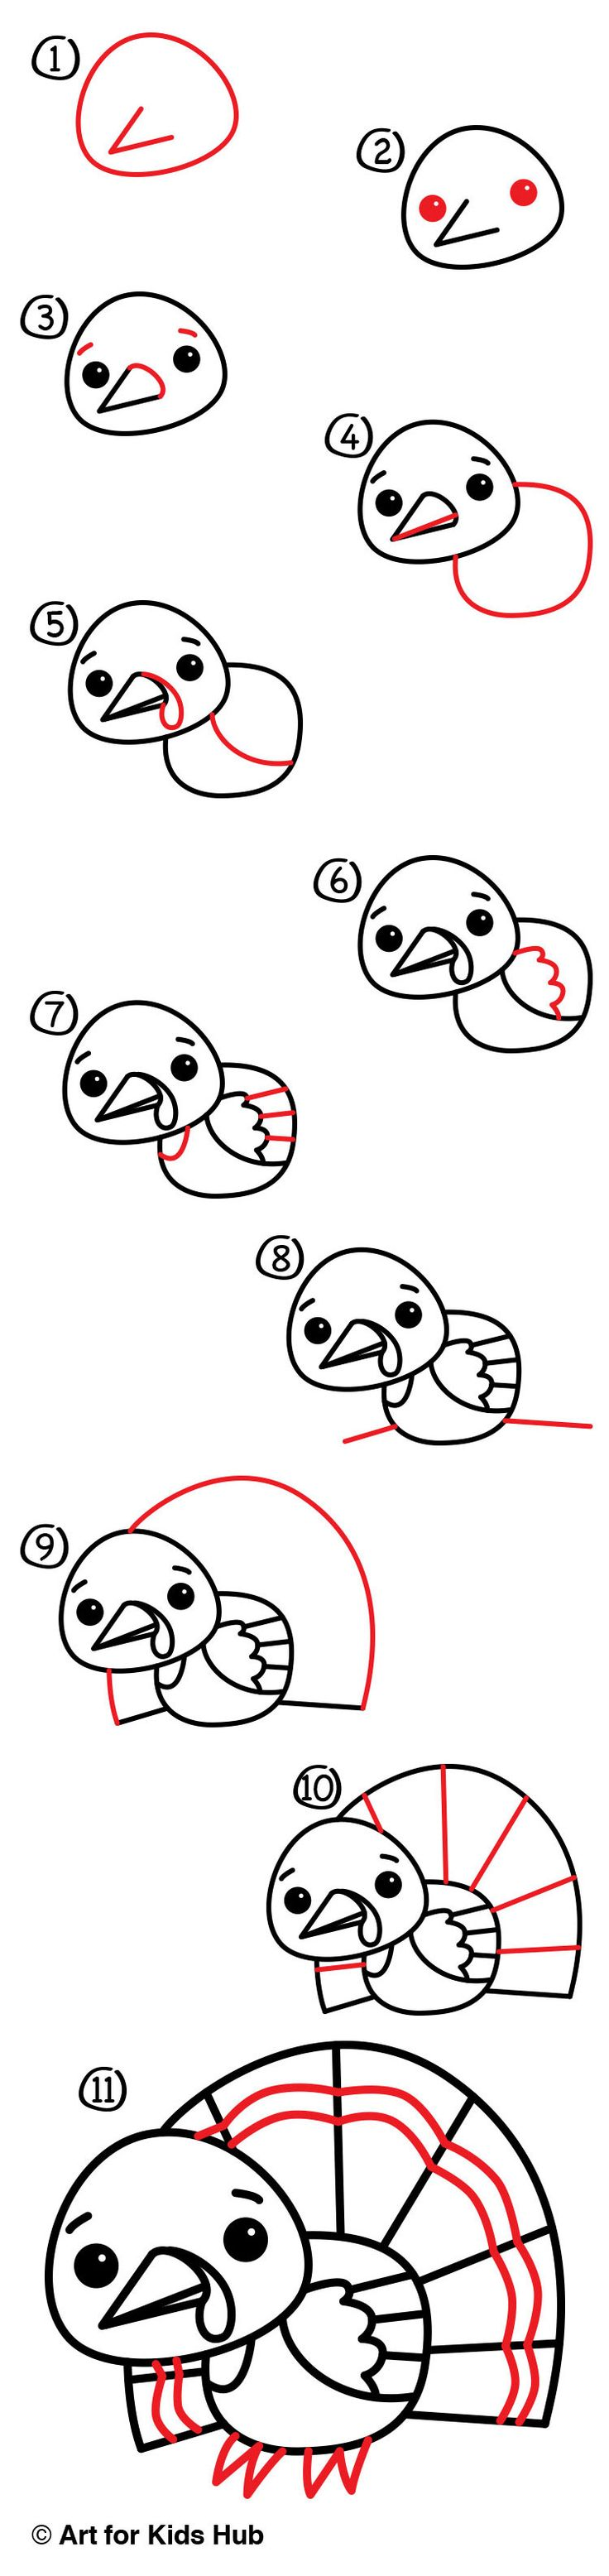 How To Draw A Cartoon Turkey  Art For Kids Hub